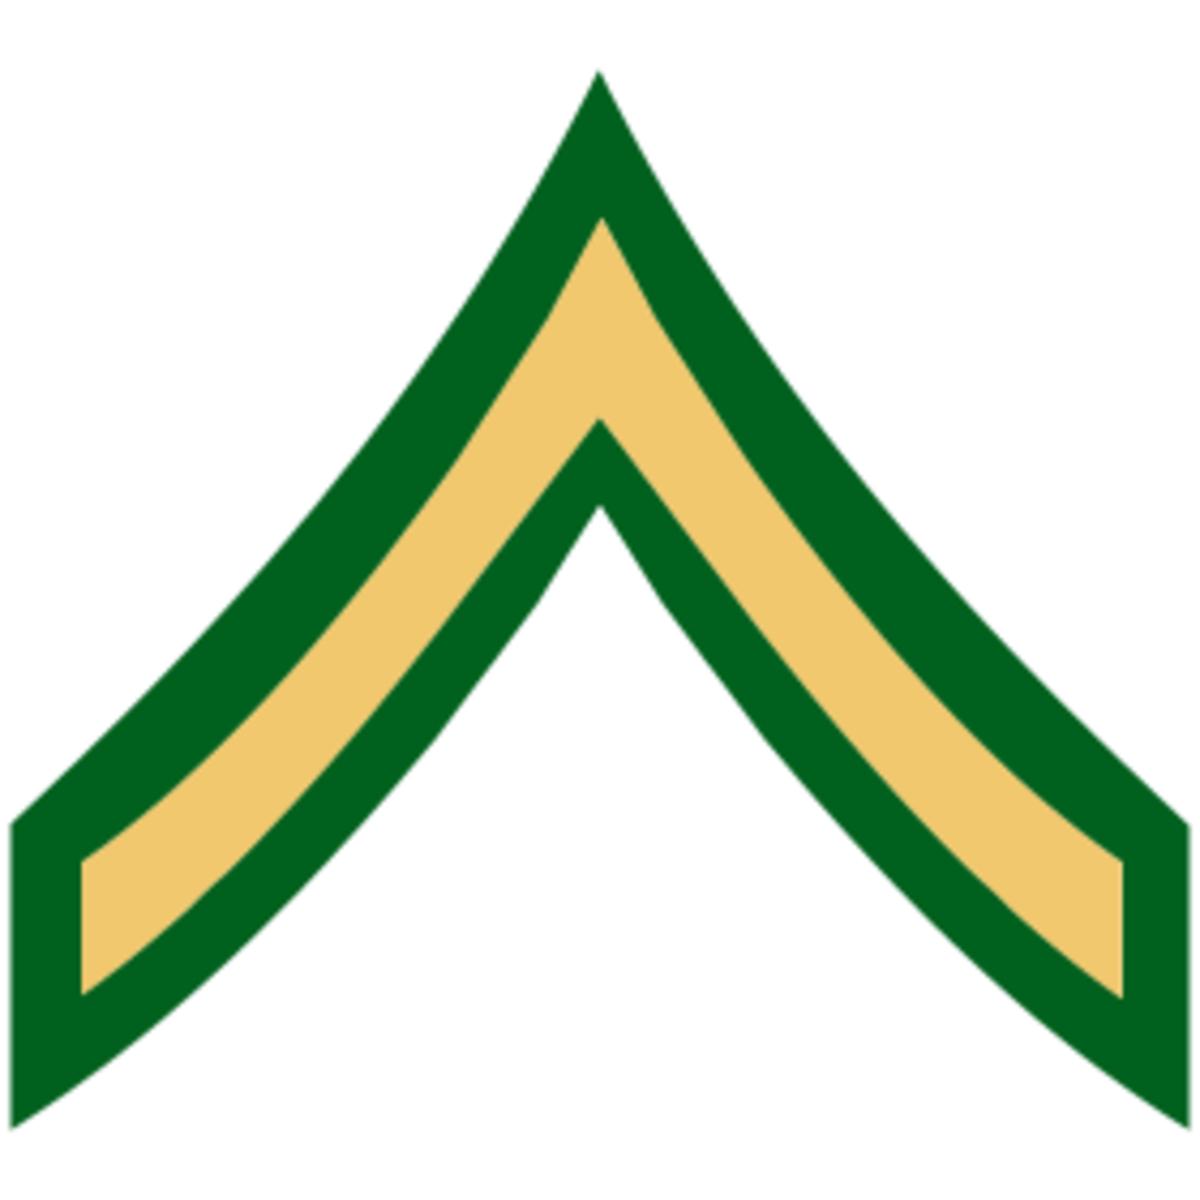 Army Ranks:  PV1, PV2 and PFC